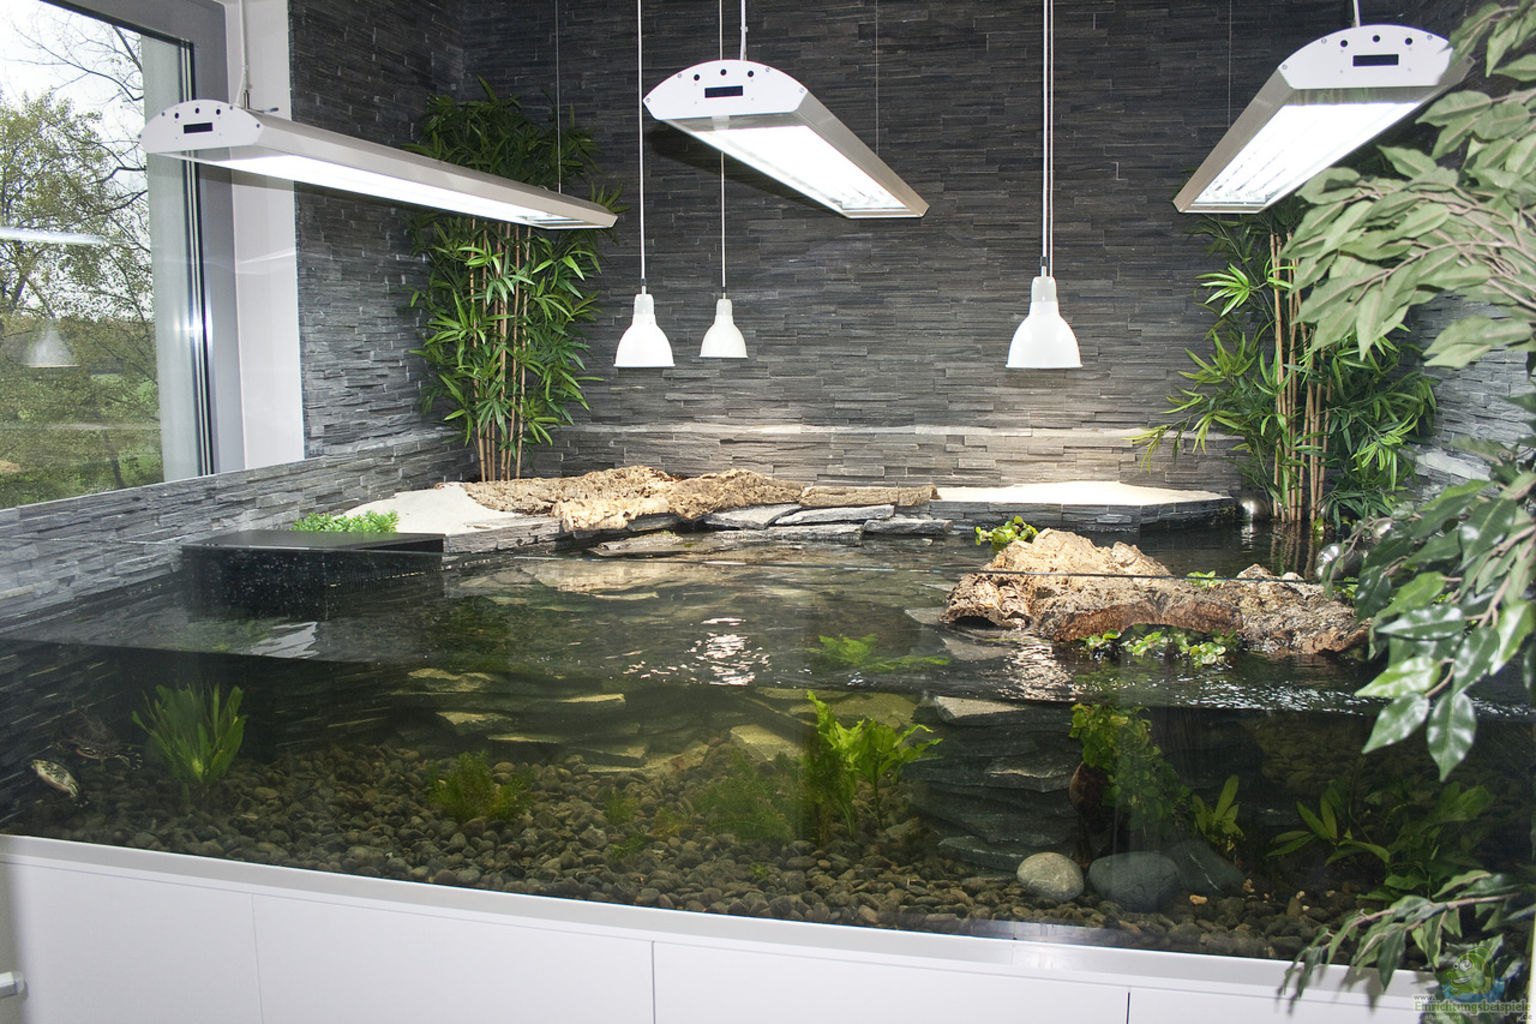 aqua terrarium 300x220x60 mit 1700 l wasser und 680 l. Black Bedroom Furniture Sets. Home Design Ideas